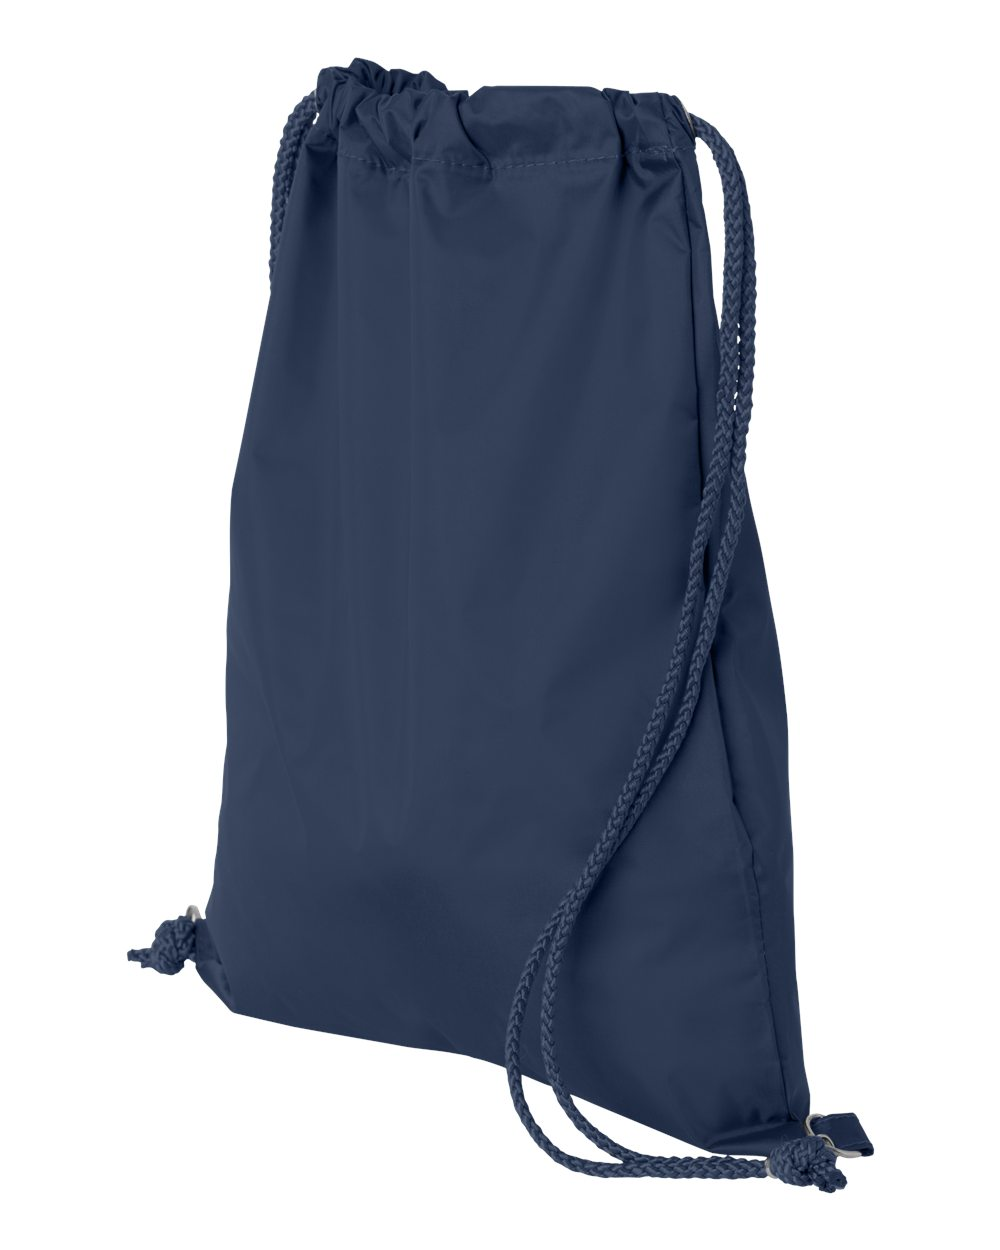 Liberty Bags 8883 - Drawstring Backpack